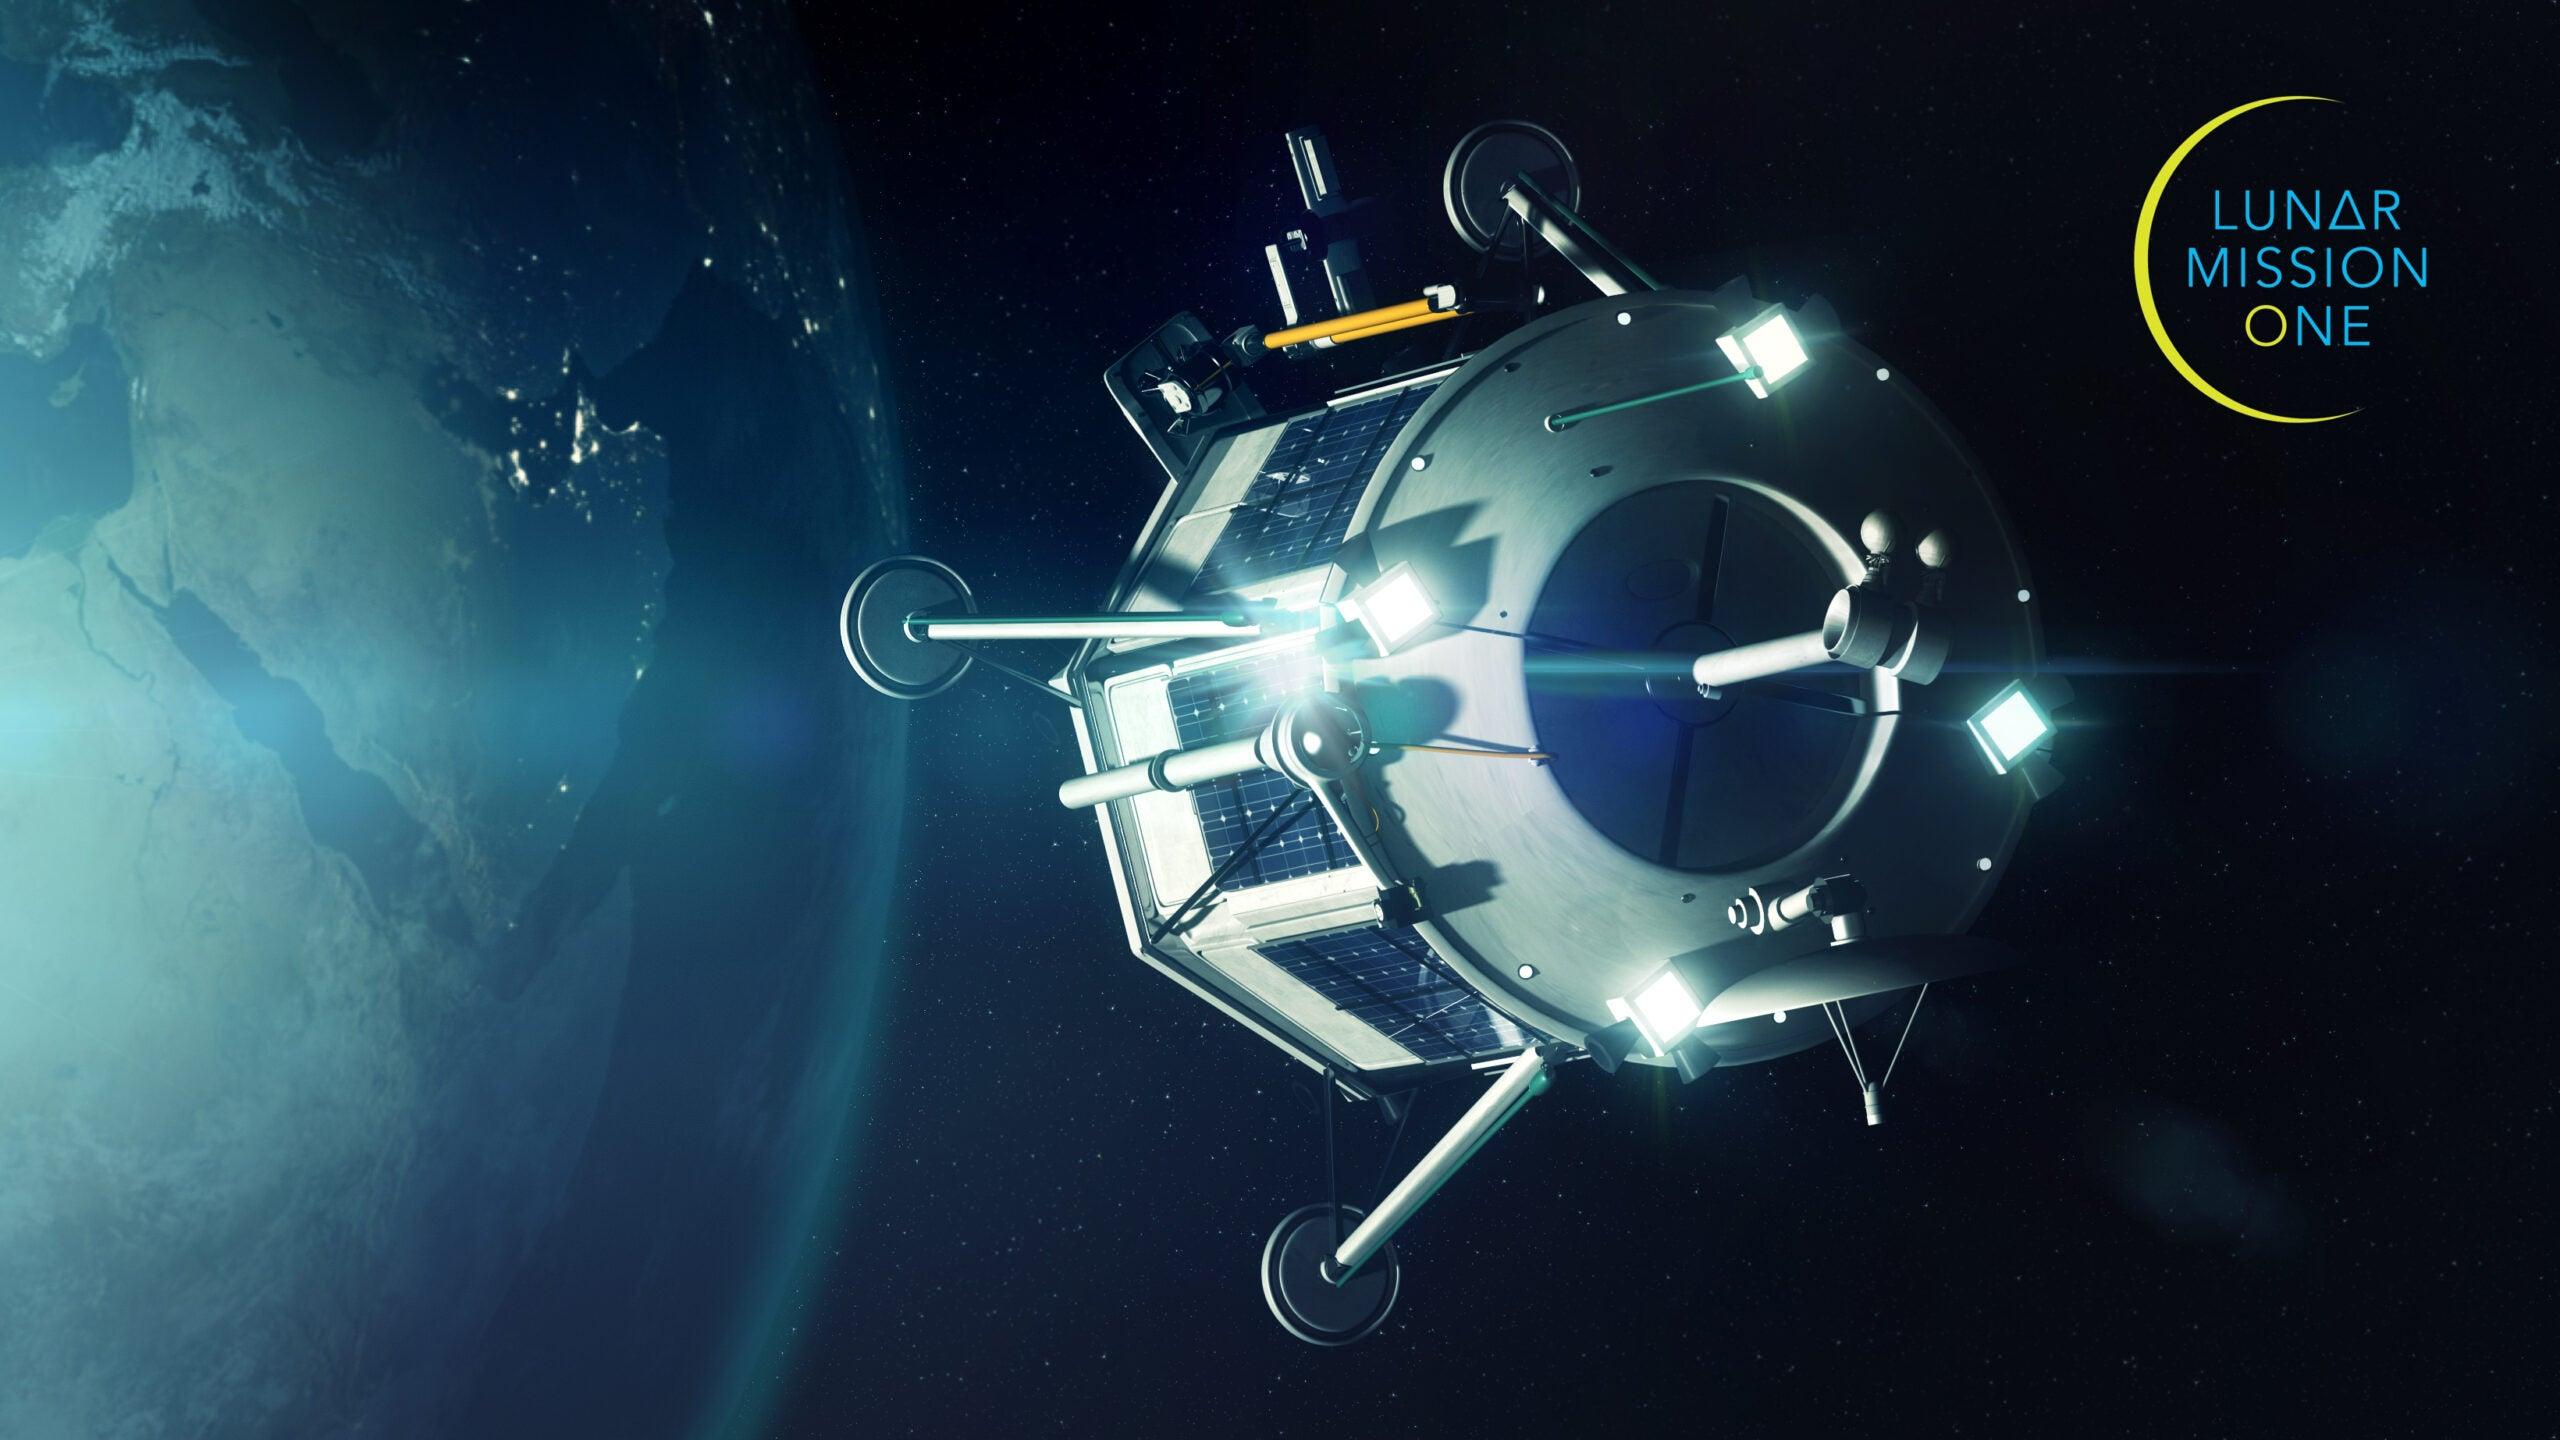 Lunar Mission Kickstarter Campaign Meets Its Funding Target